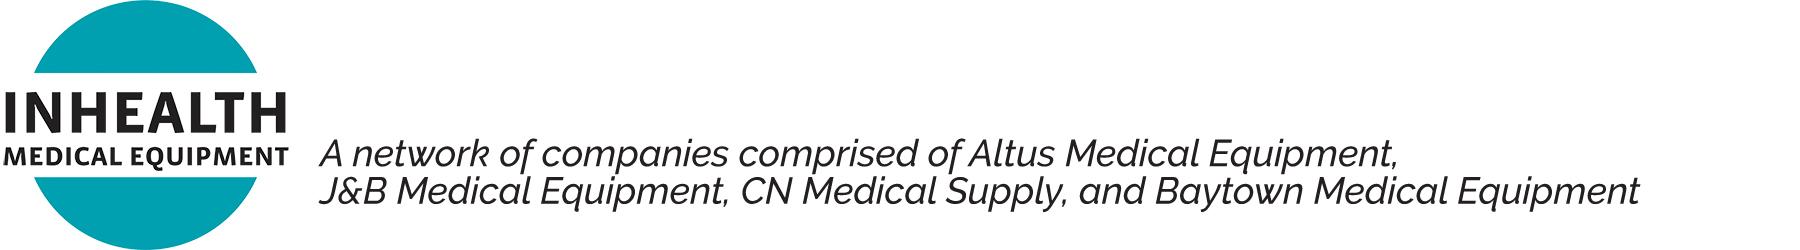 Insurance – InHealth Medical Equipment